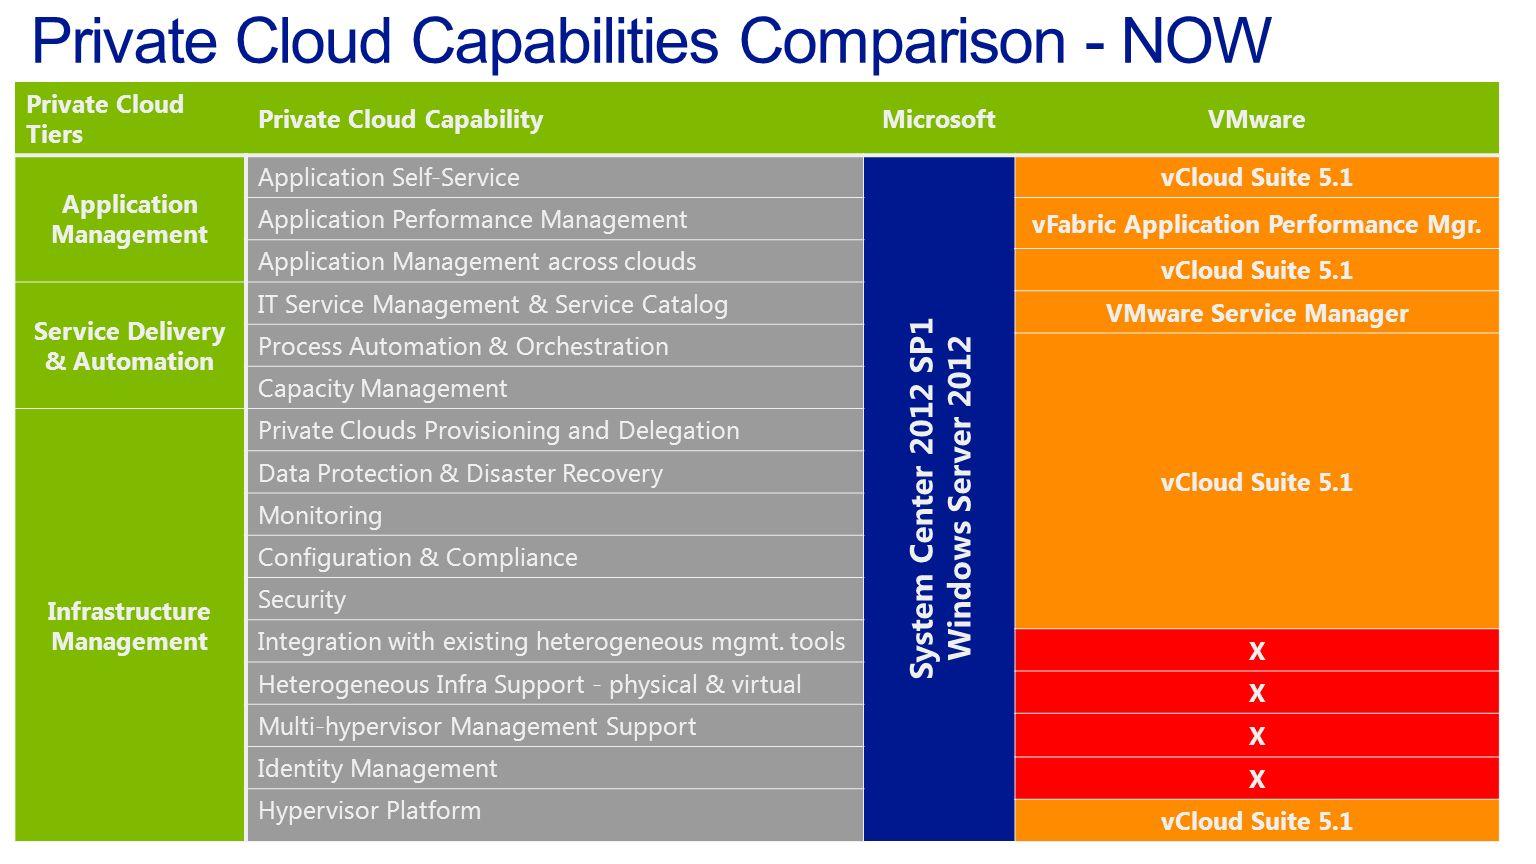 Private Cloud Tiers Private Cloud CapabilityMicrosoftVMware Application Management Application Self-Service System Center 2012 SP1 Windows Server 2012